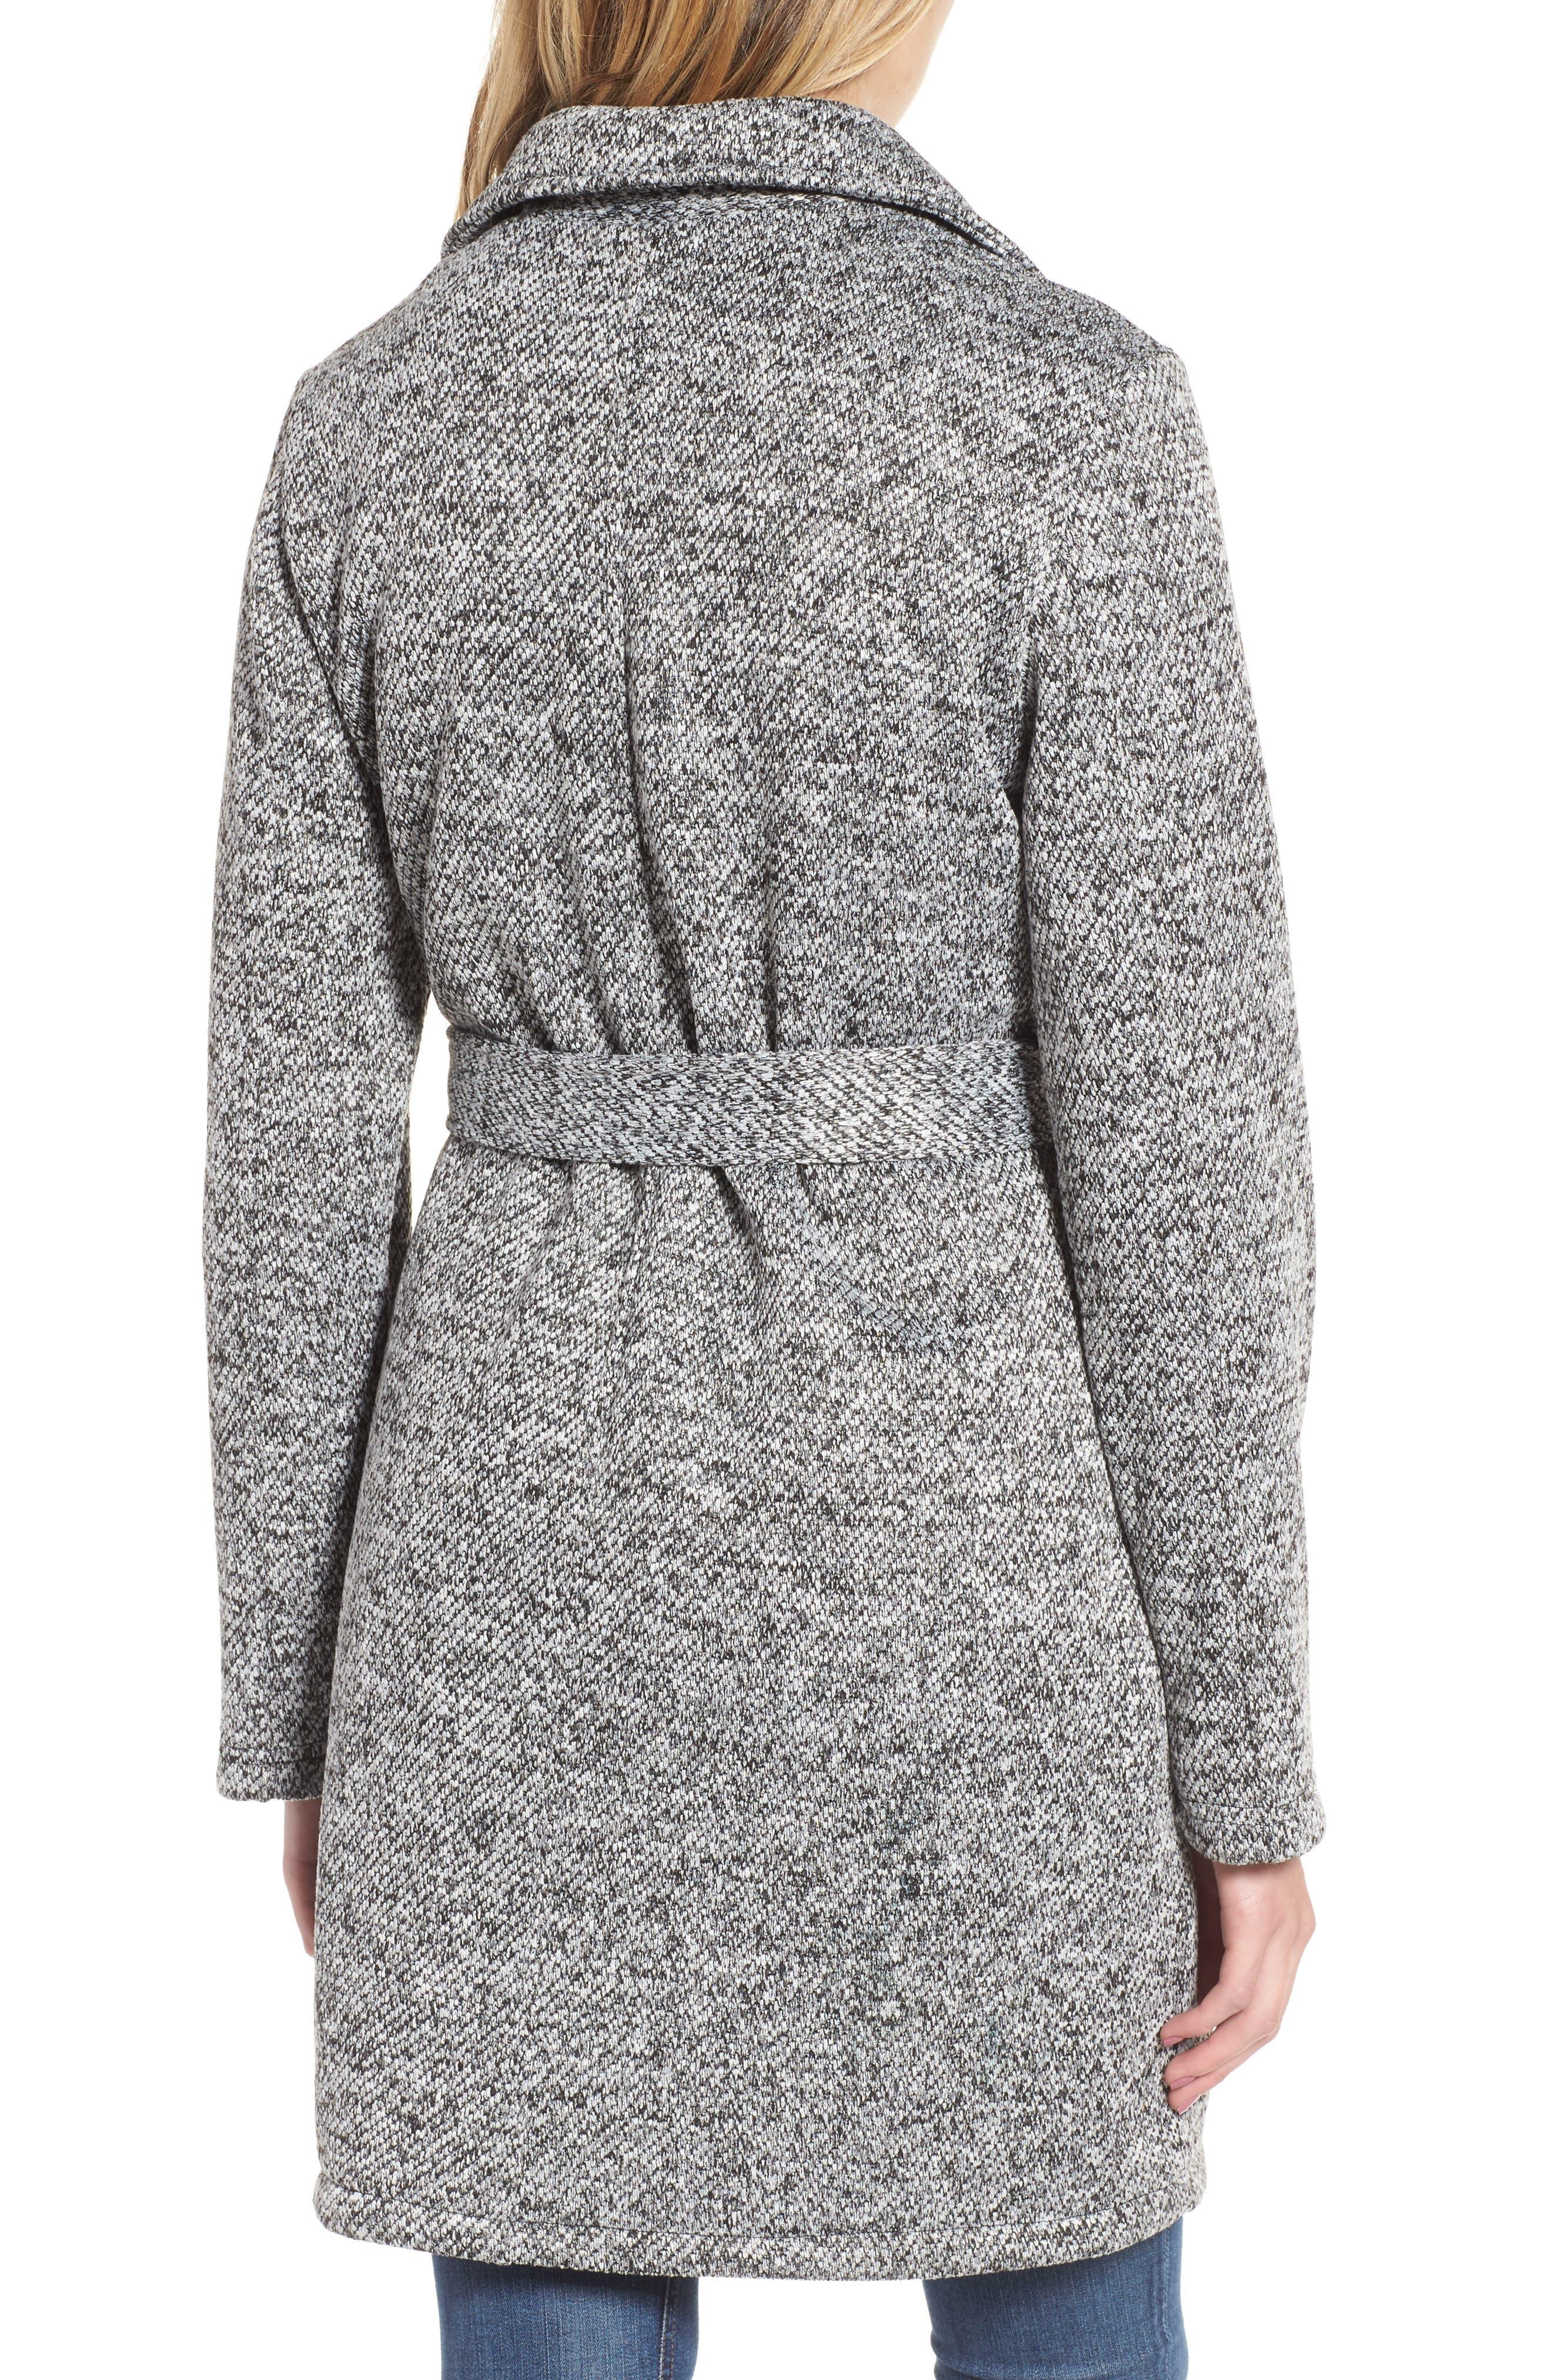 Belted Fleece Jacket,                             Alternate thumbnail 2, color,                             Light Grey Heather